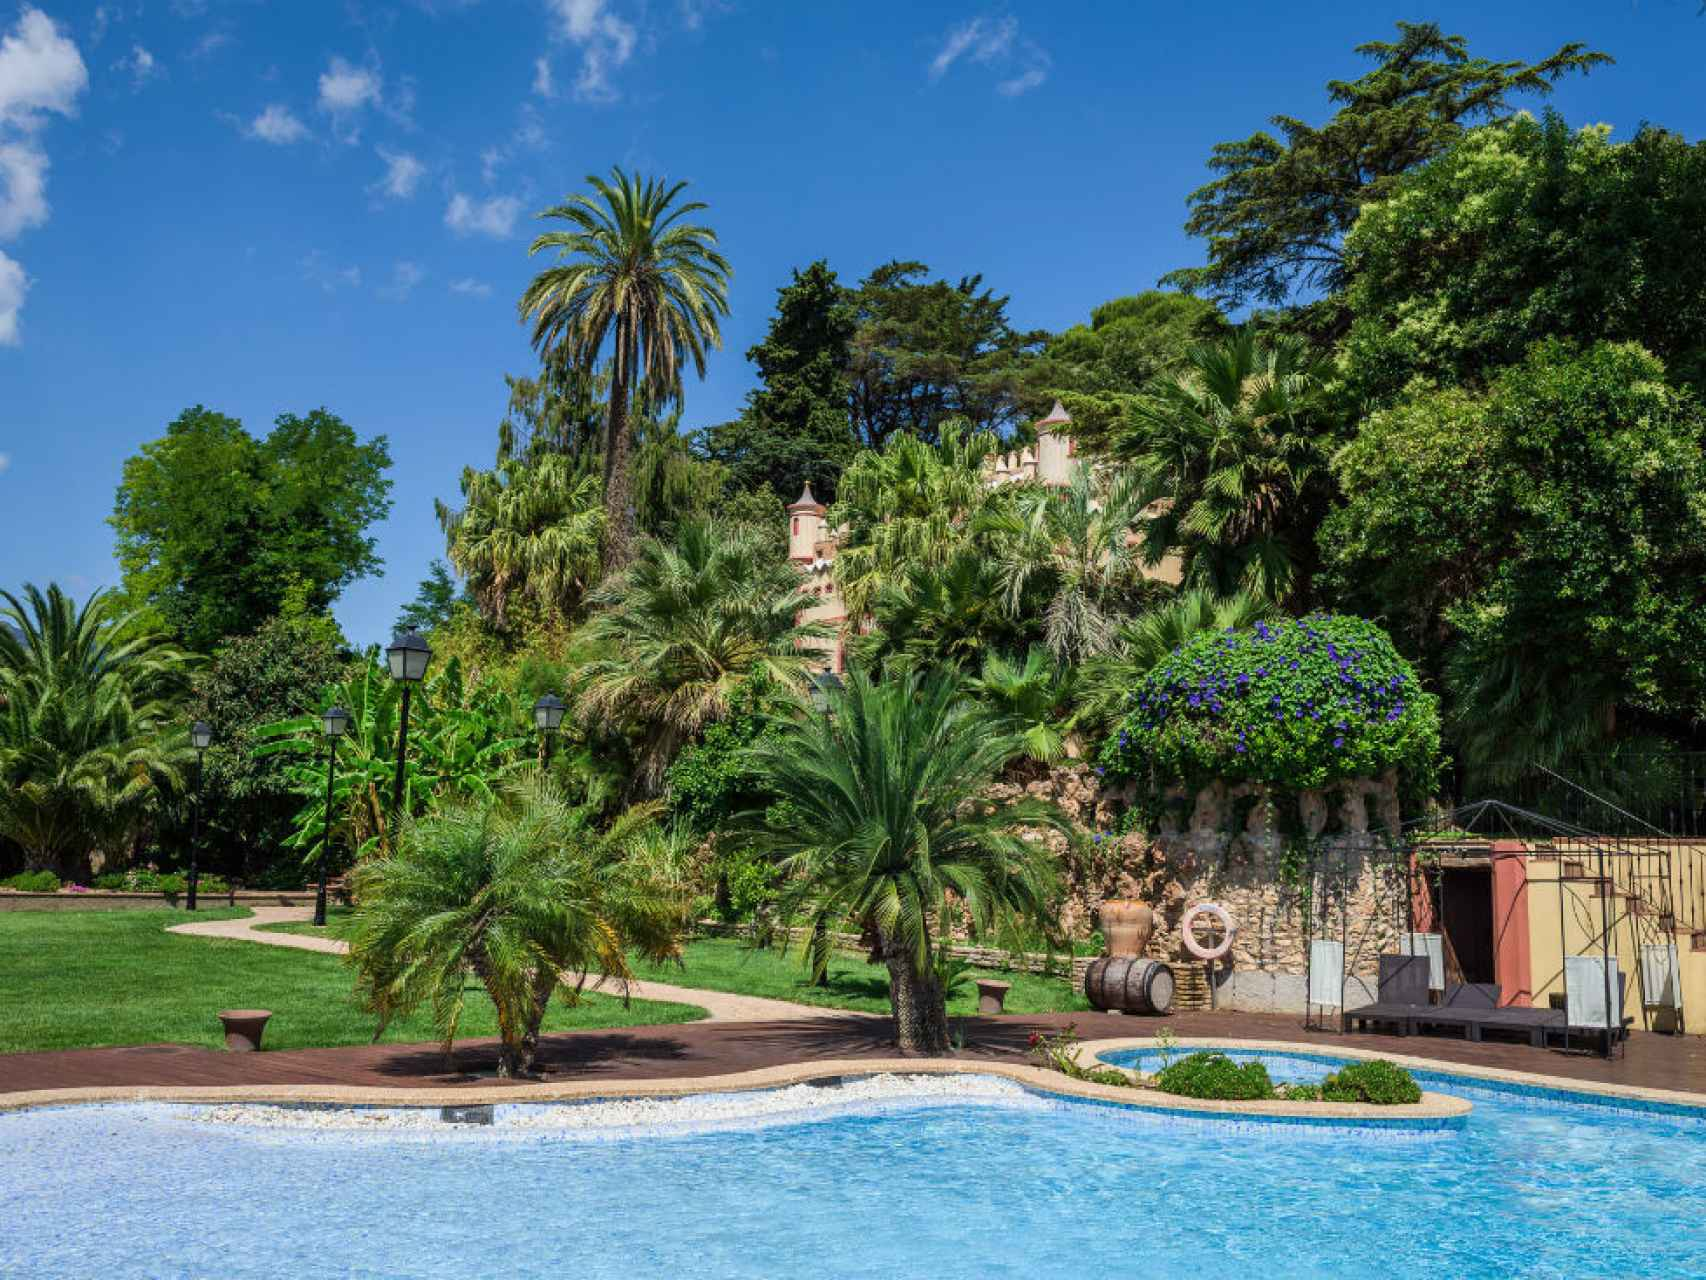 El alojamiento de 5 estrellas de Villa Retiro.